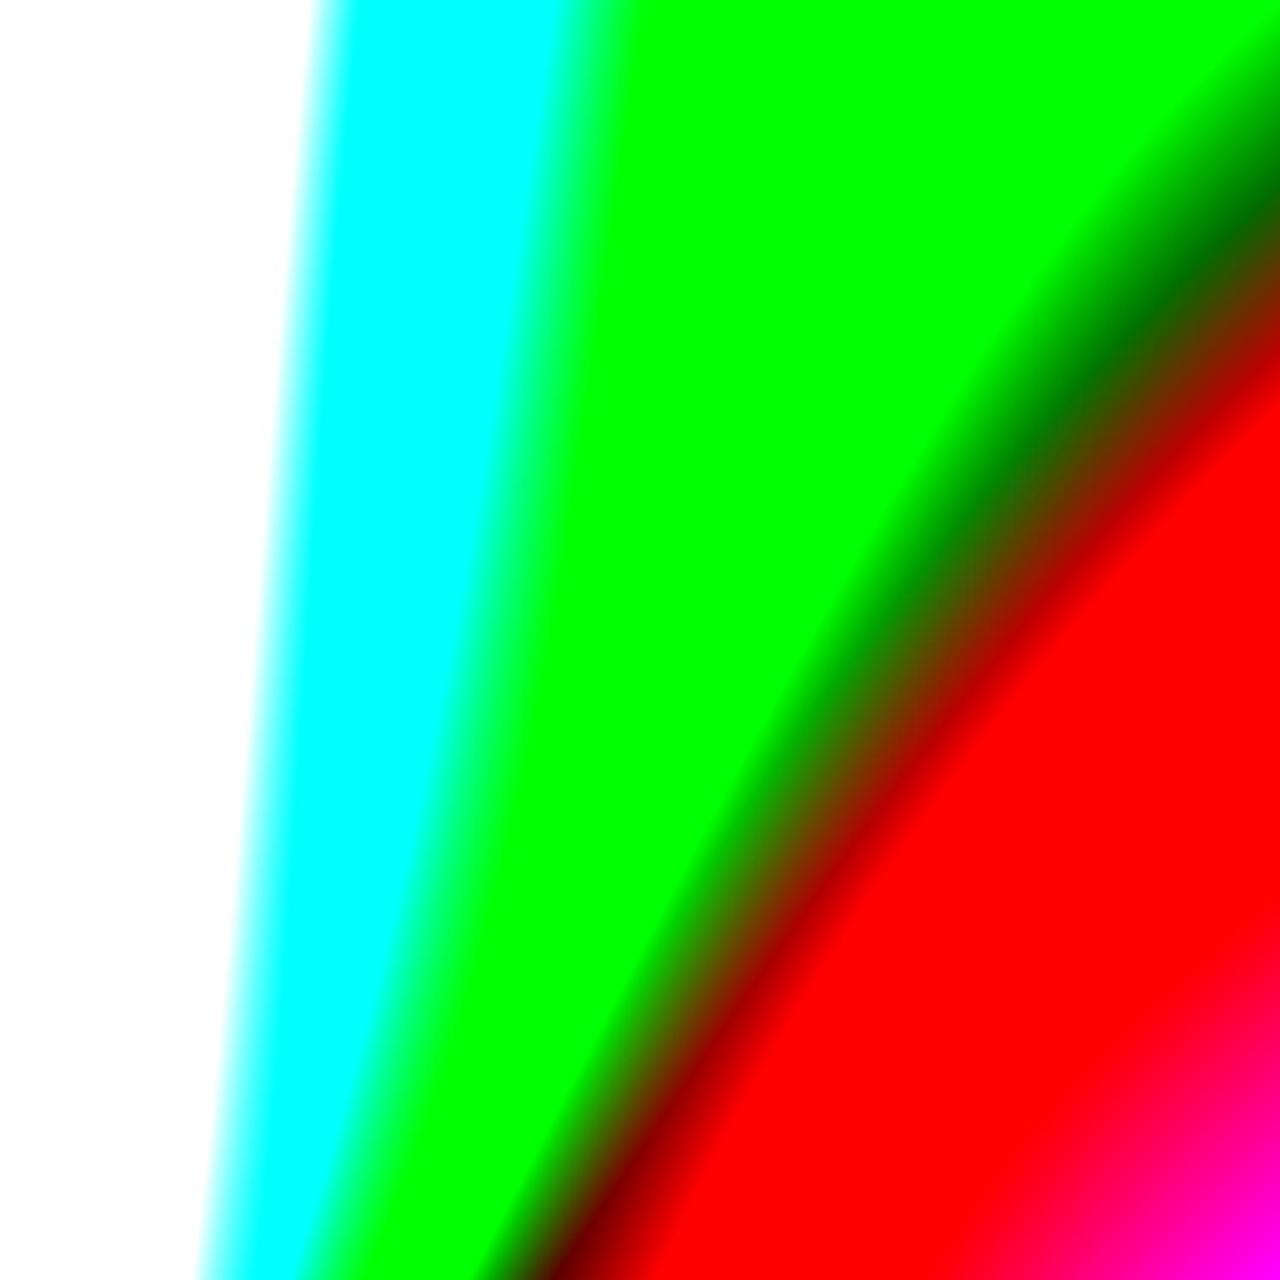 #abstract#programming#abstract art#minimal#aesthetic#generative art#surreal#dream #artists on tumblr #digital art